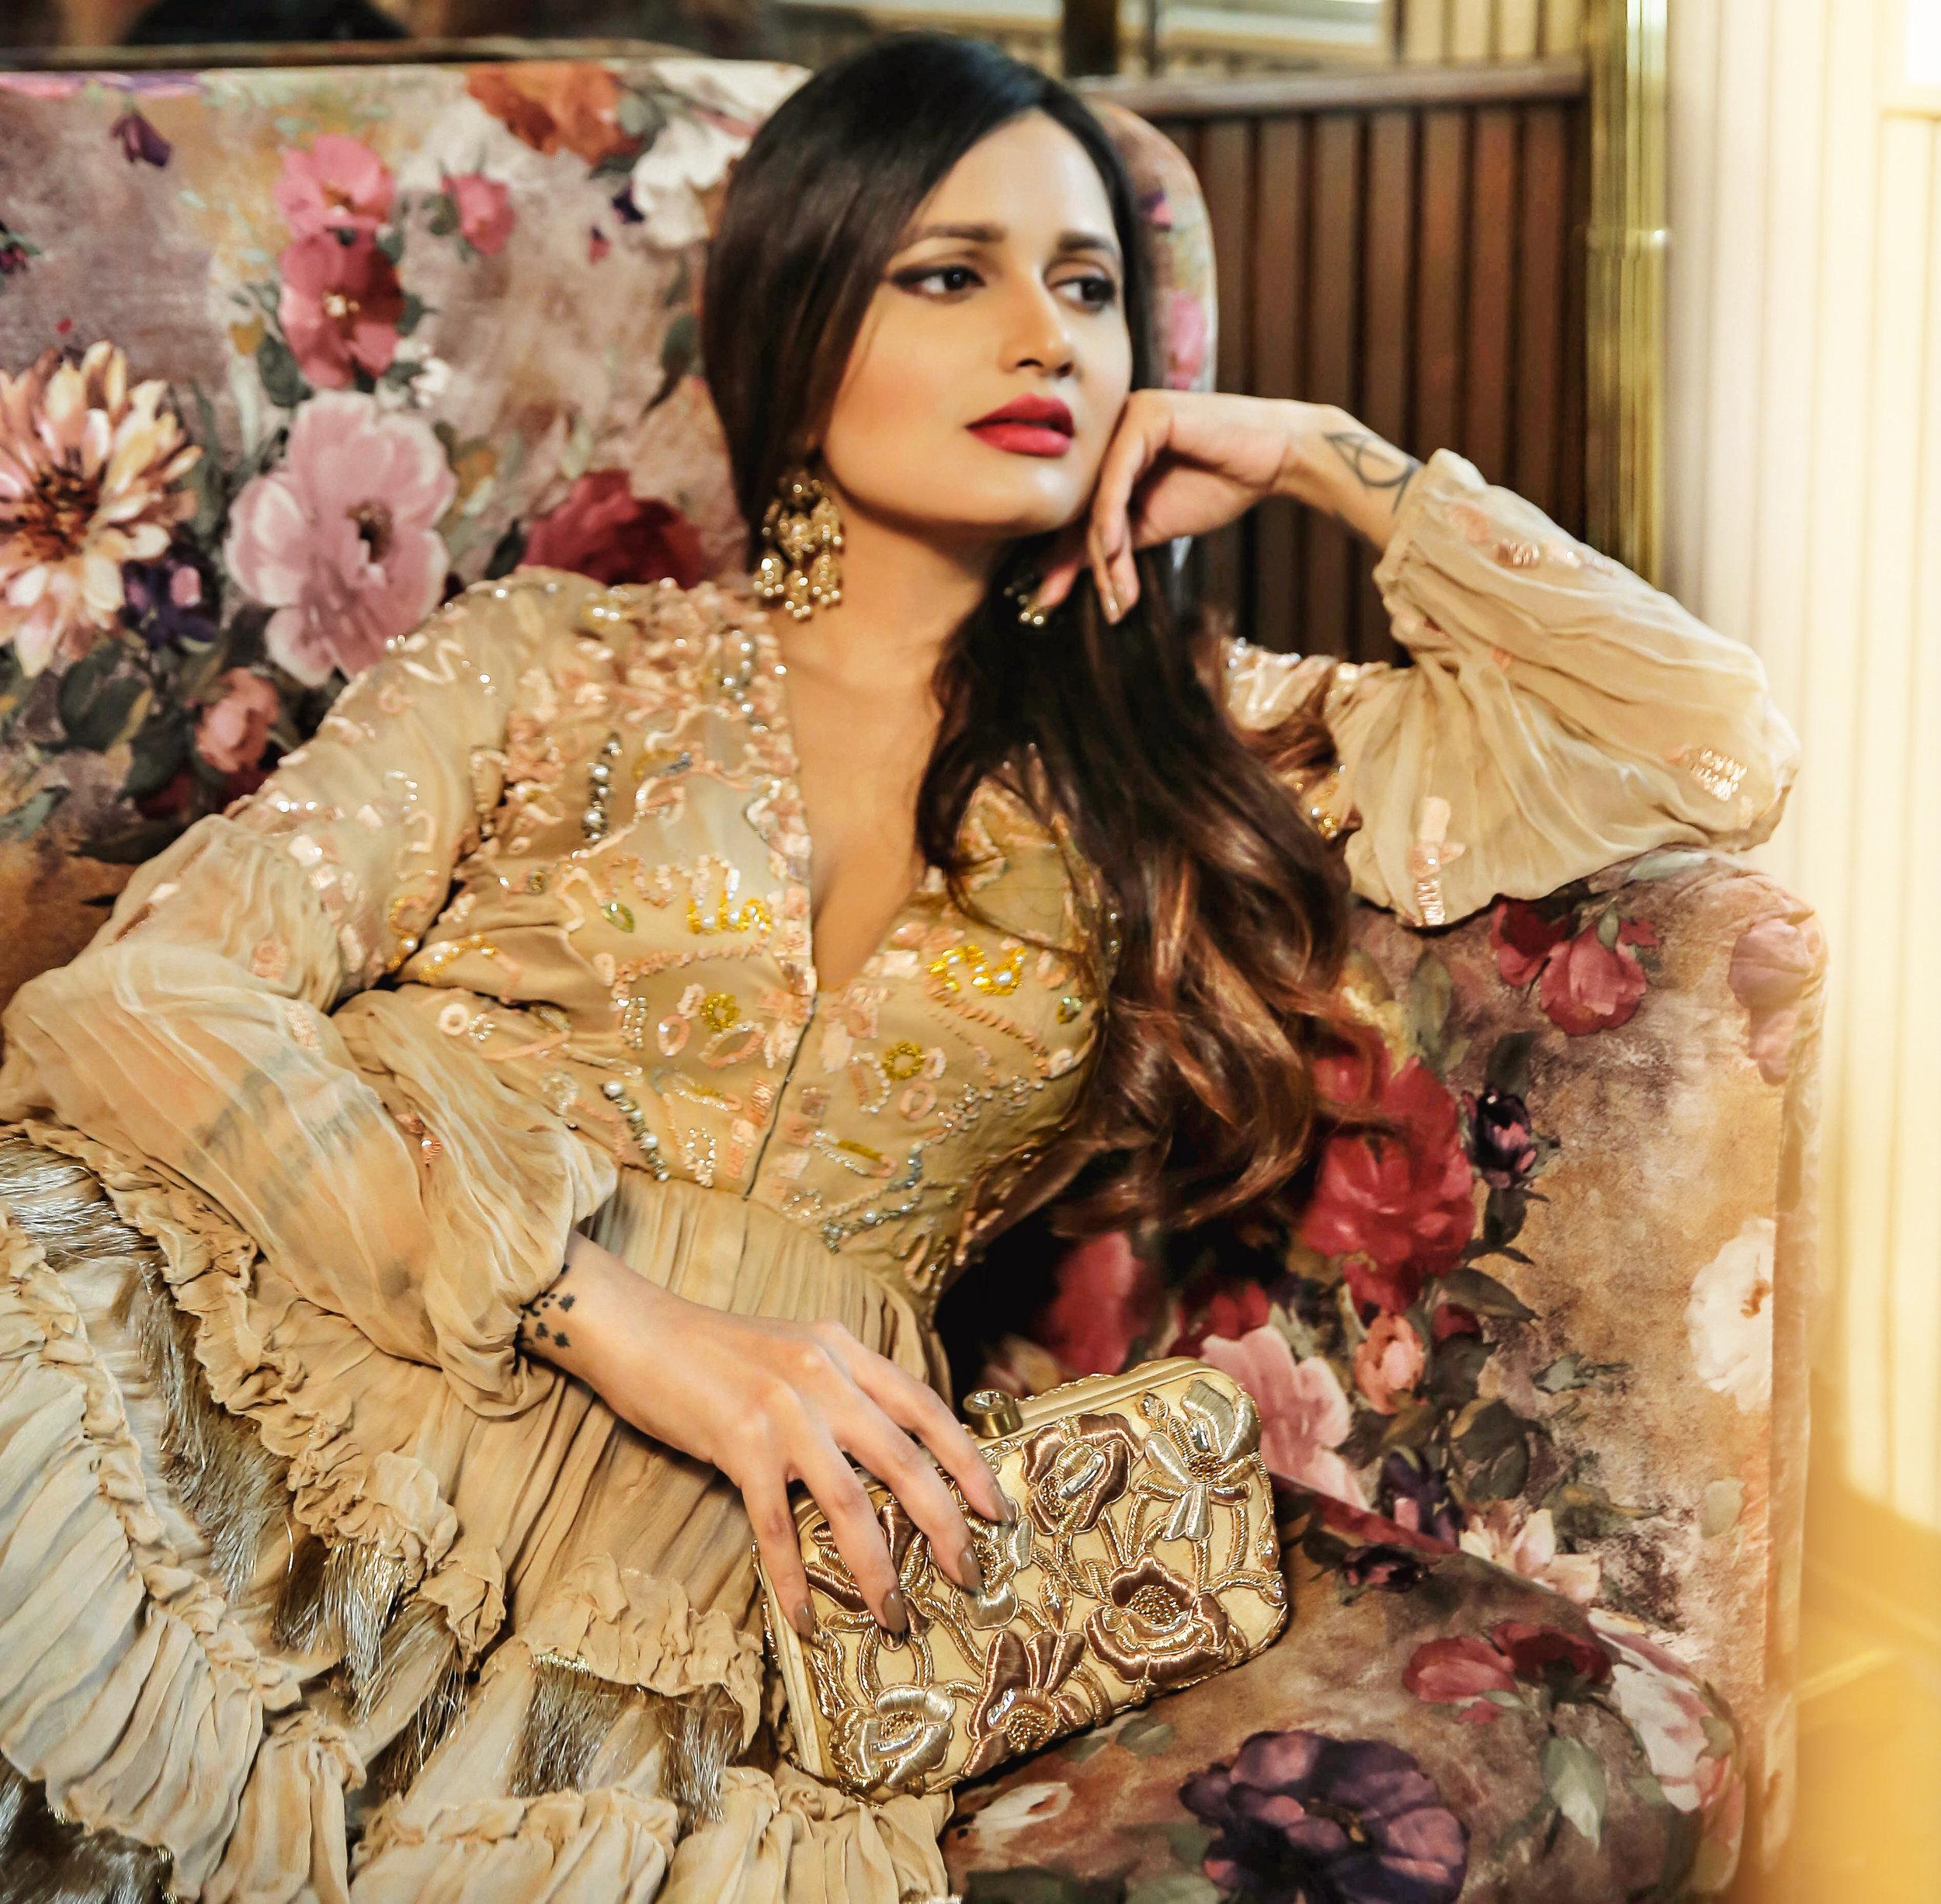 ohaila-khan-nidhi-kunder-the-chic-armoire-9